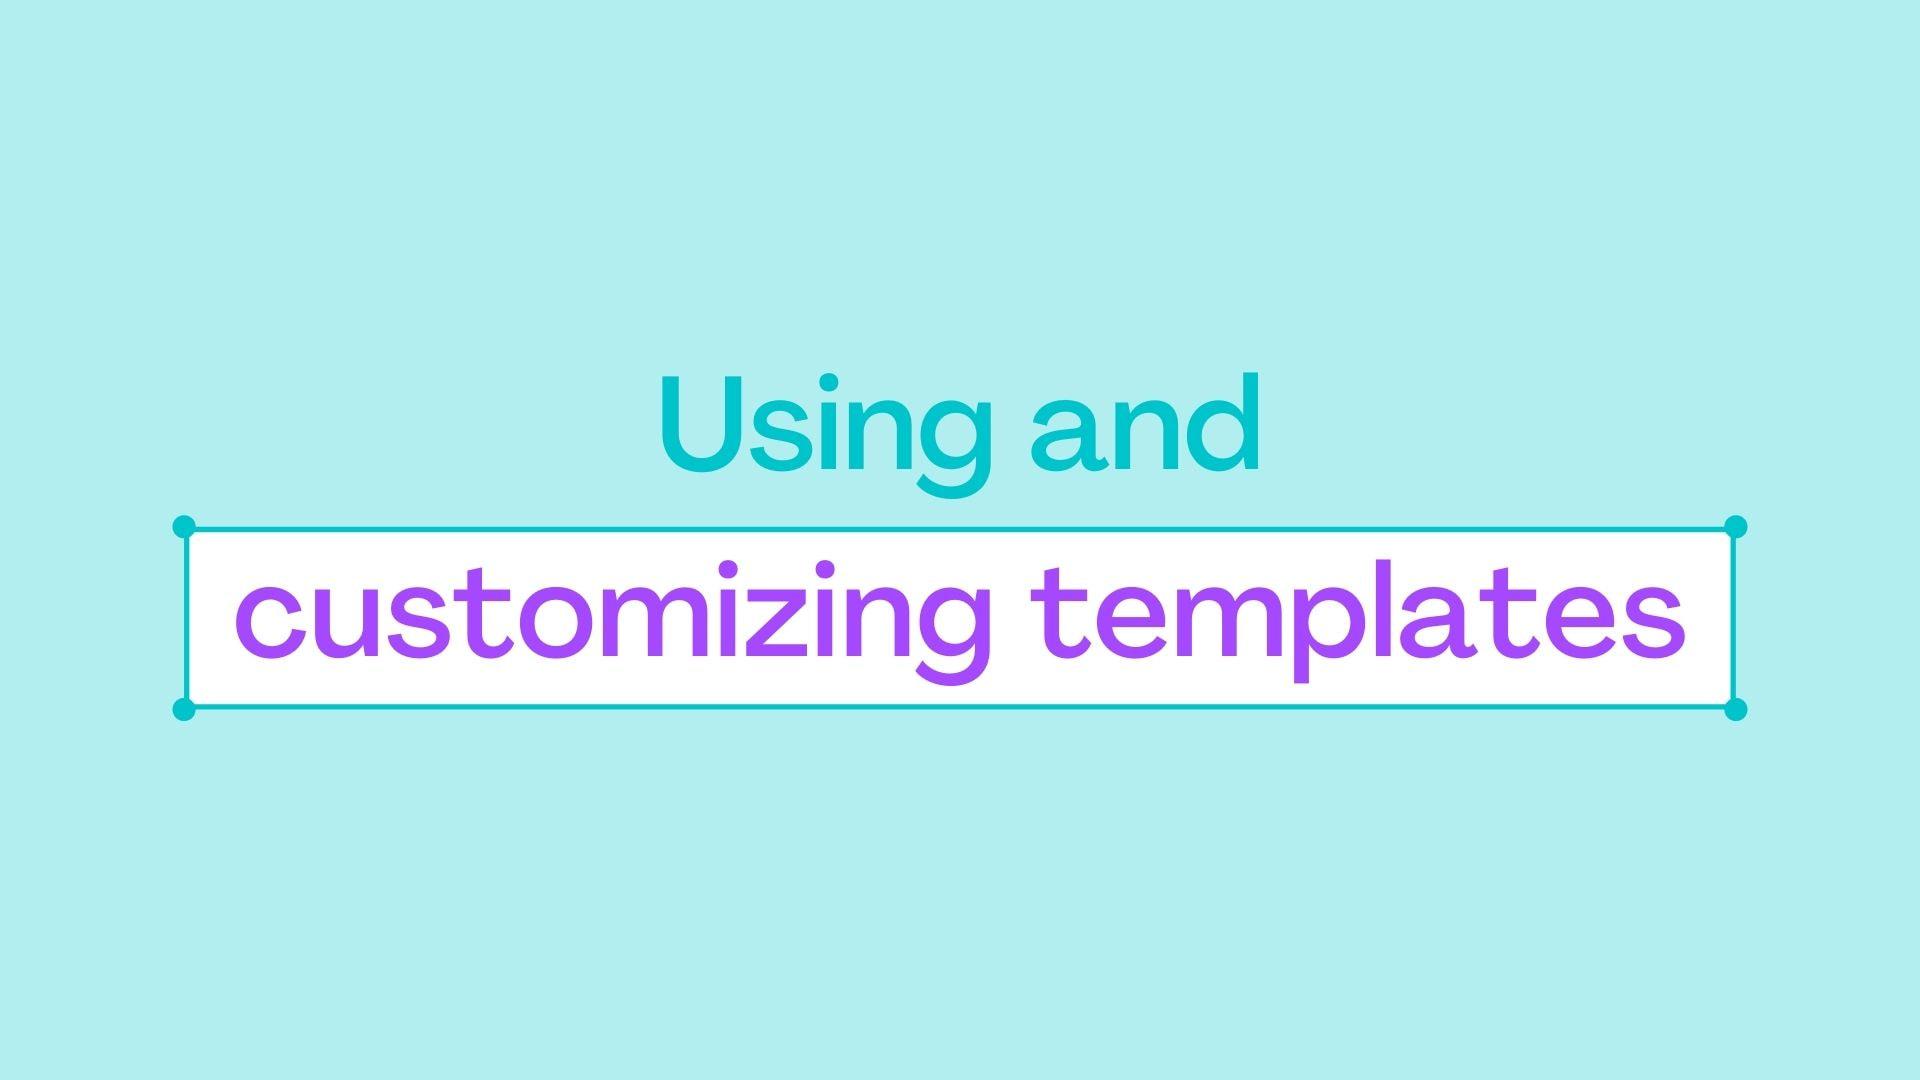 1.2 Using and customizing templates